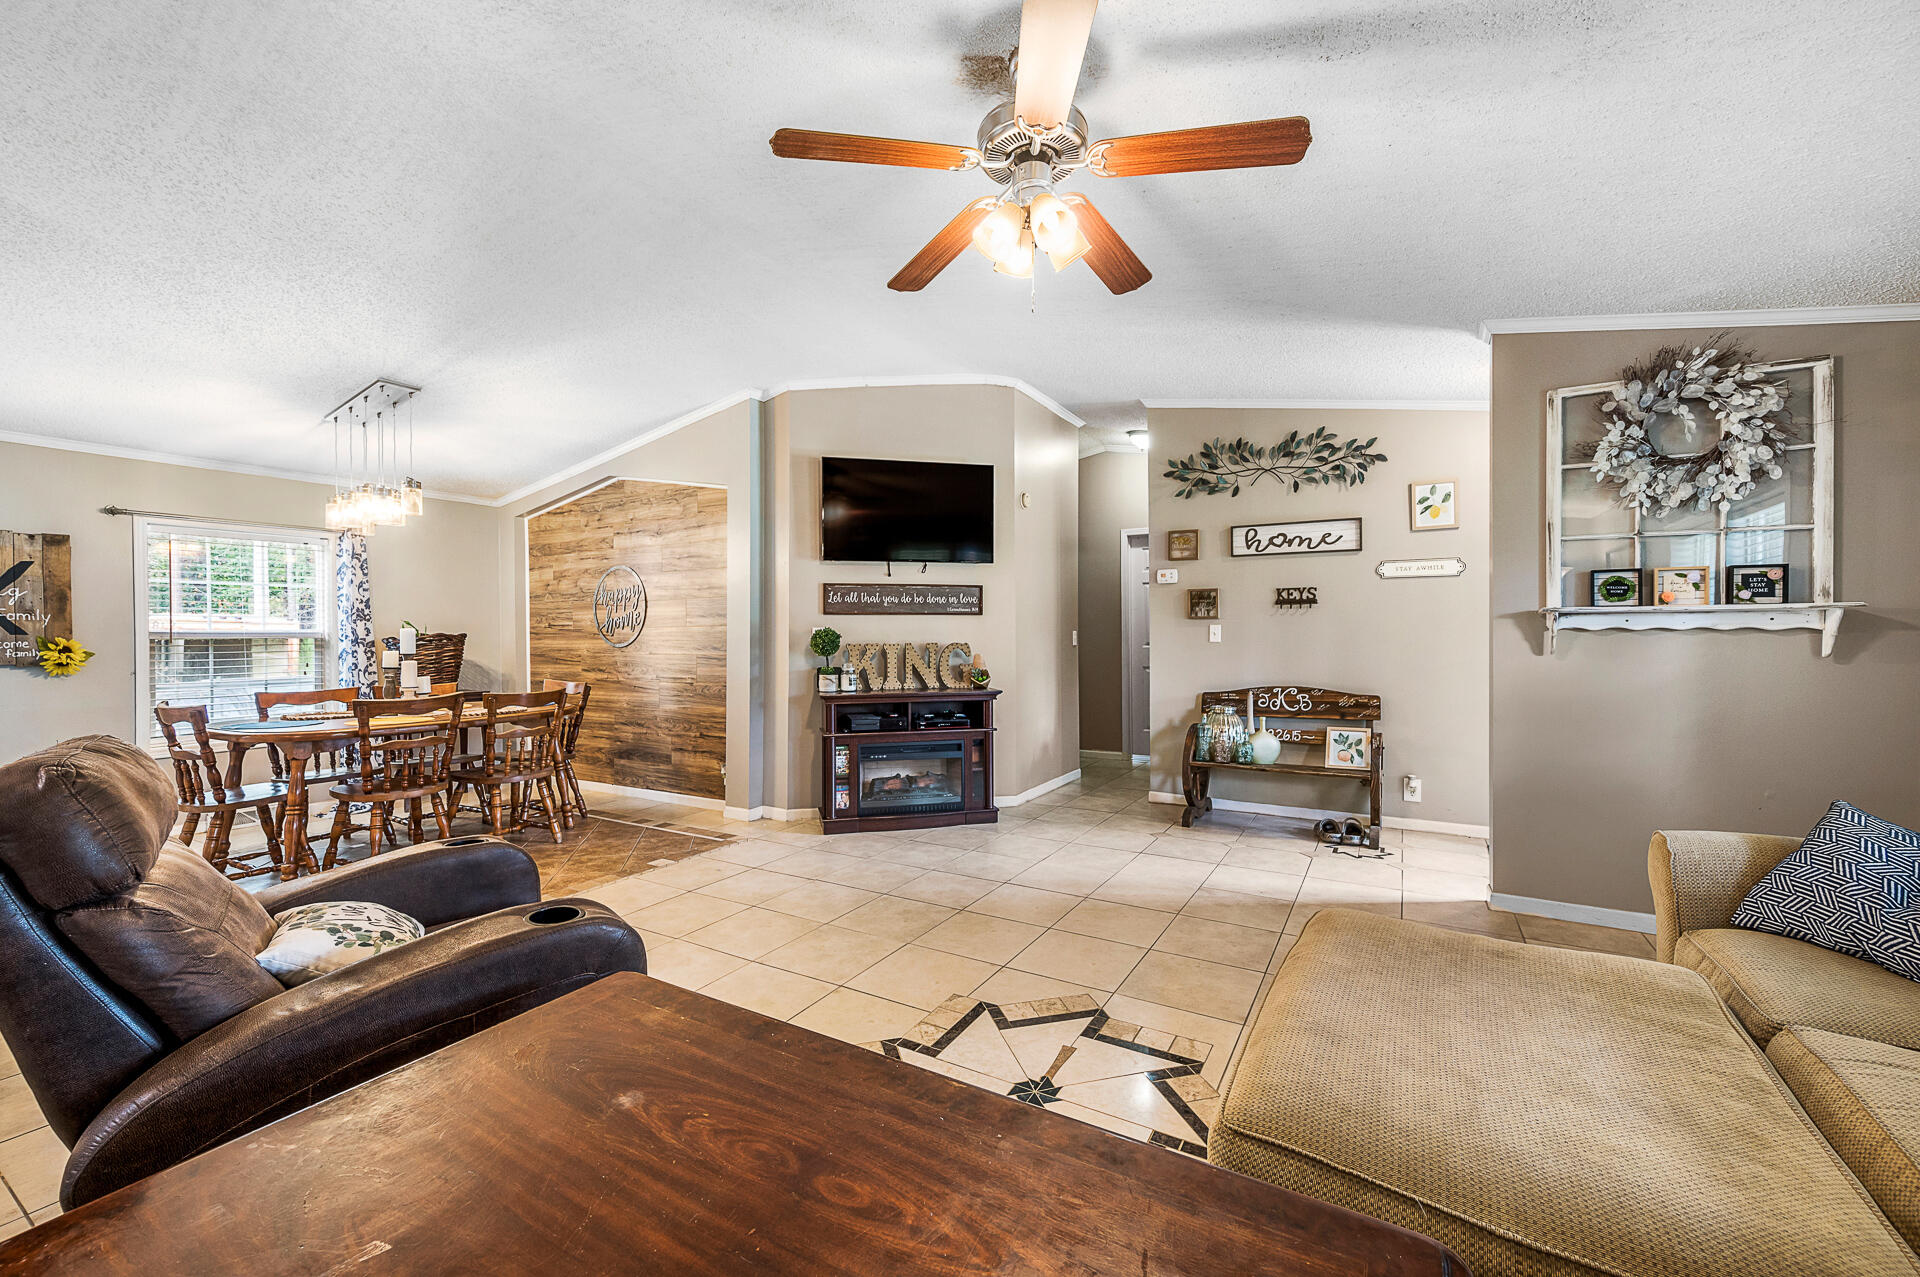 Clemson Terrace Homes For Sale - 250 Medina, Summerville, SC - 1